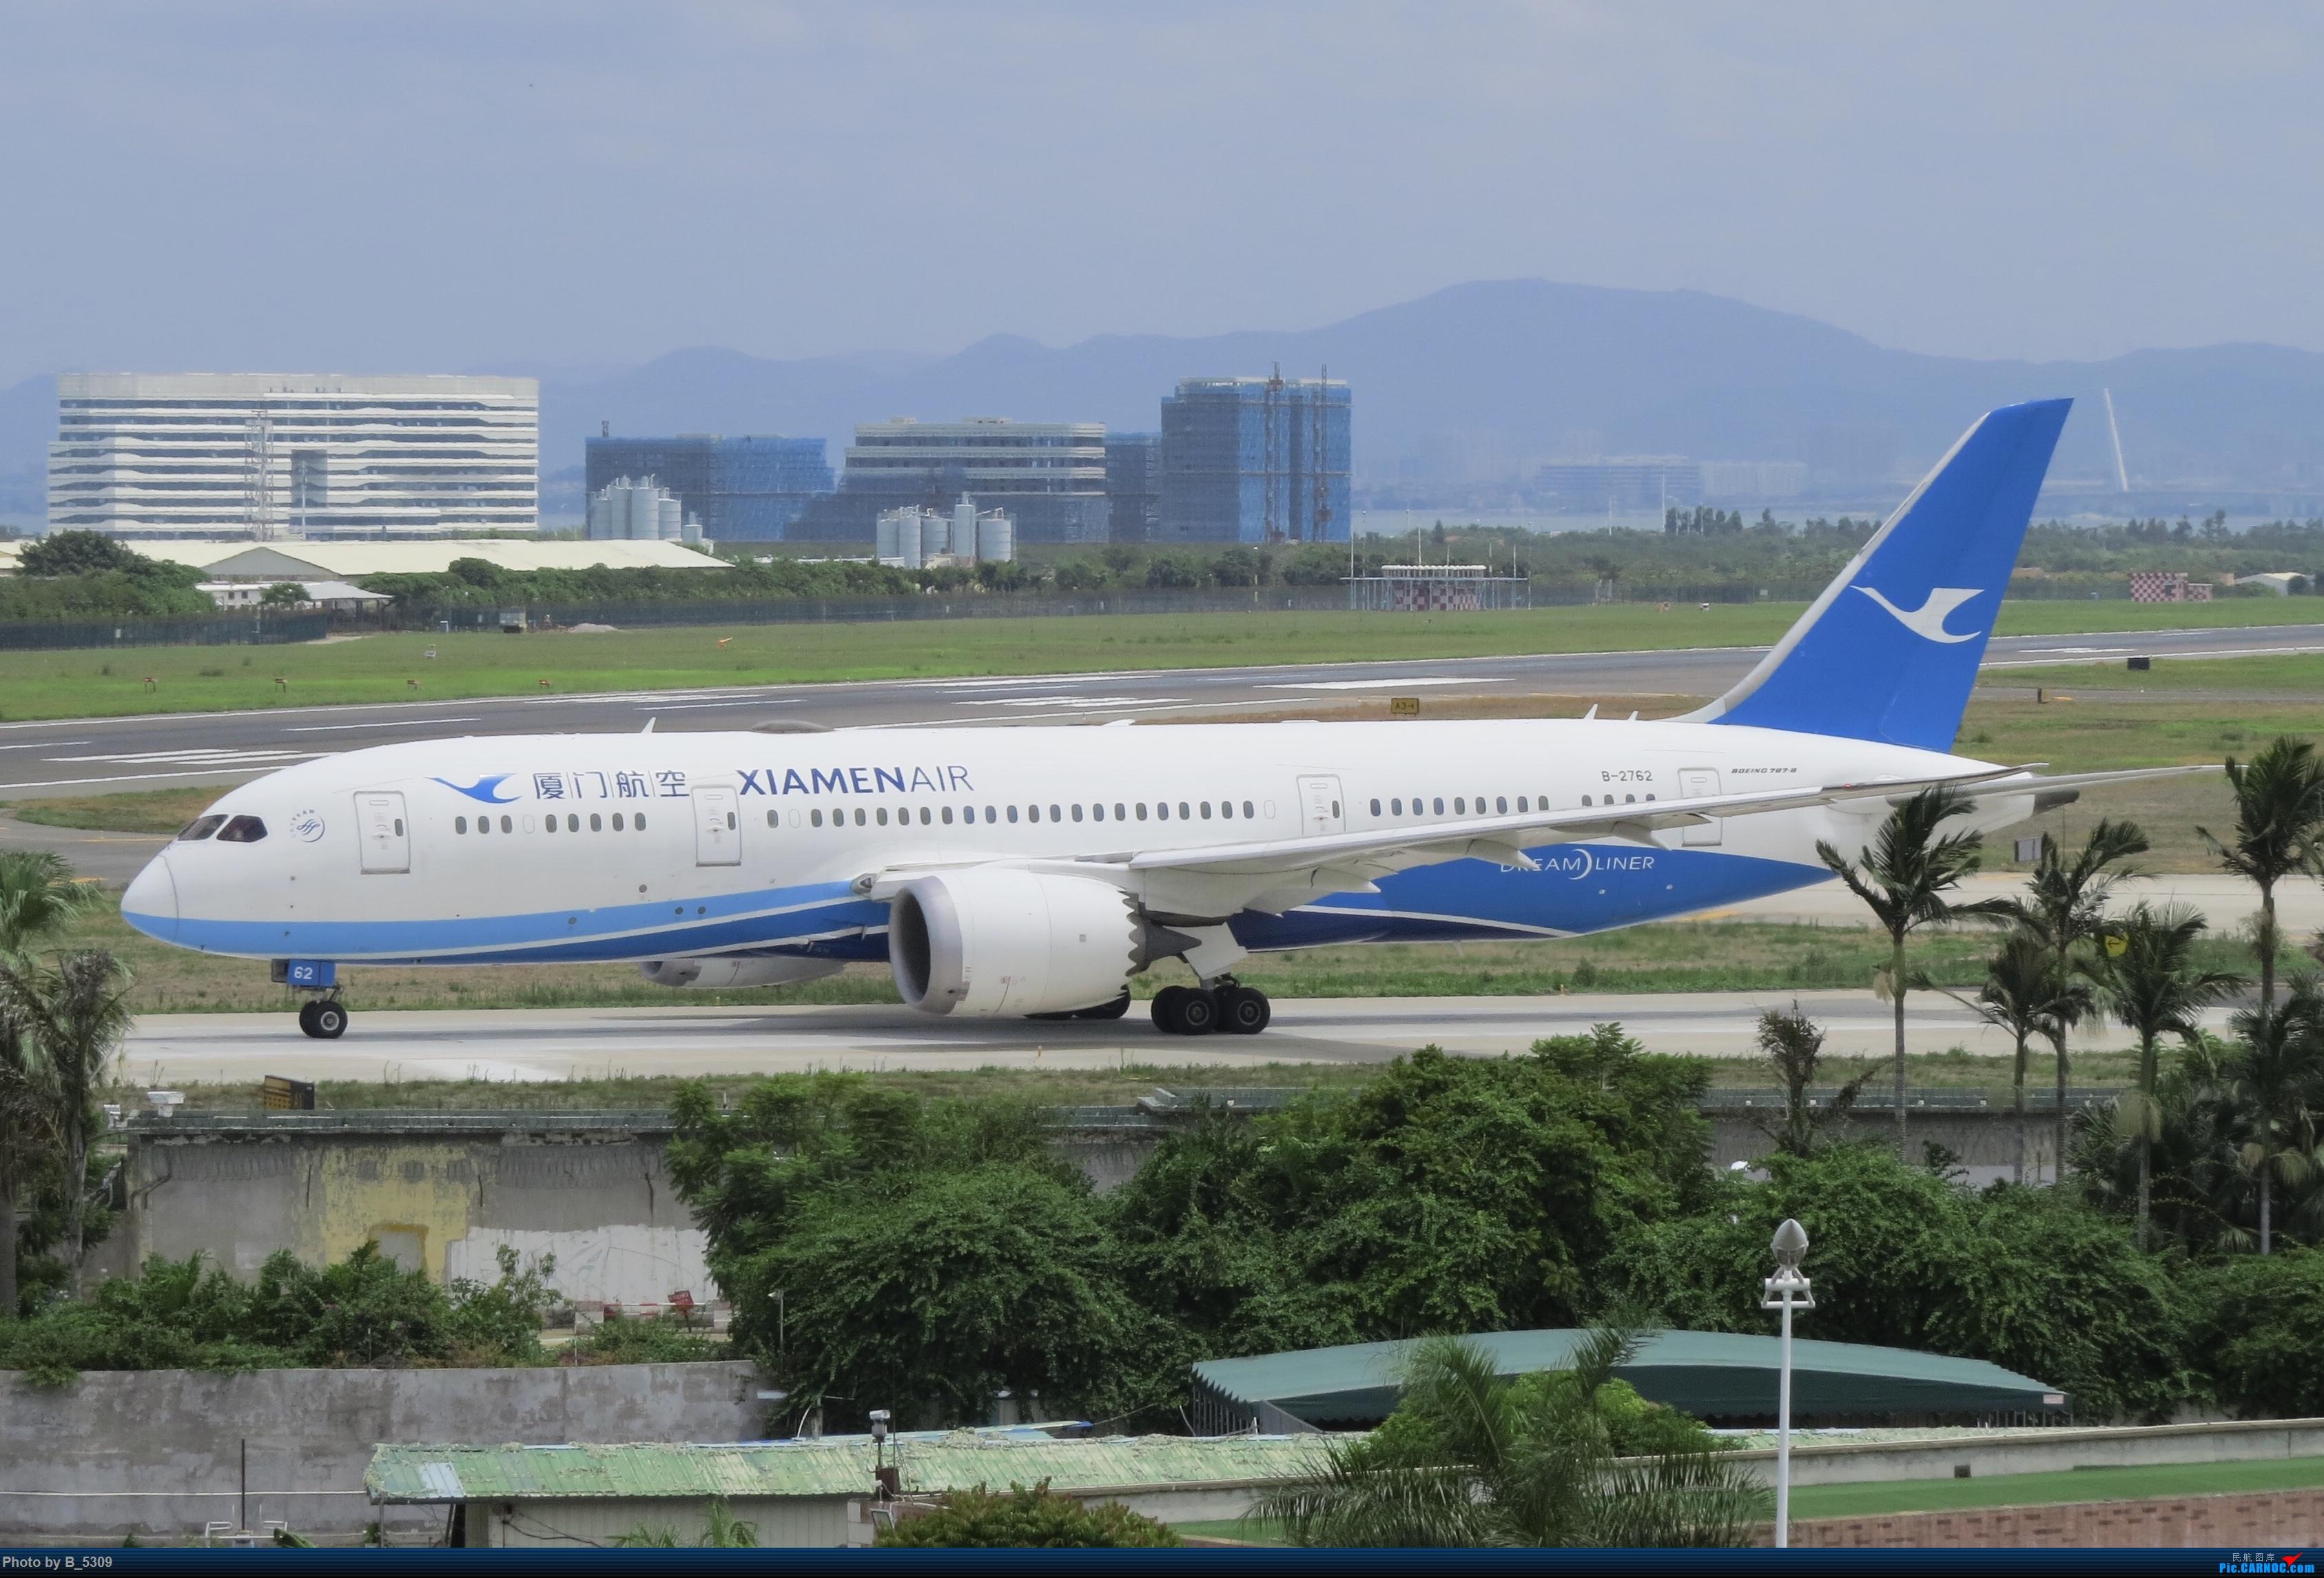 Re:[原创]白鹭窝终于换向了。。。 BOEING 787-8 B-2762 中国厦门高崎国际机场